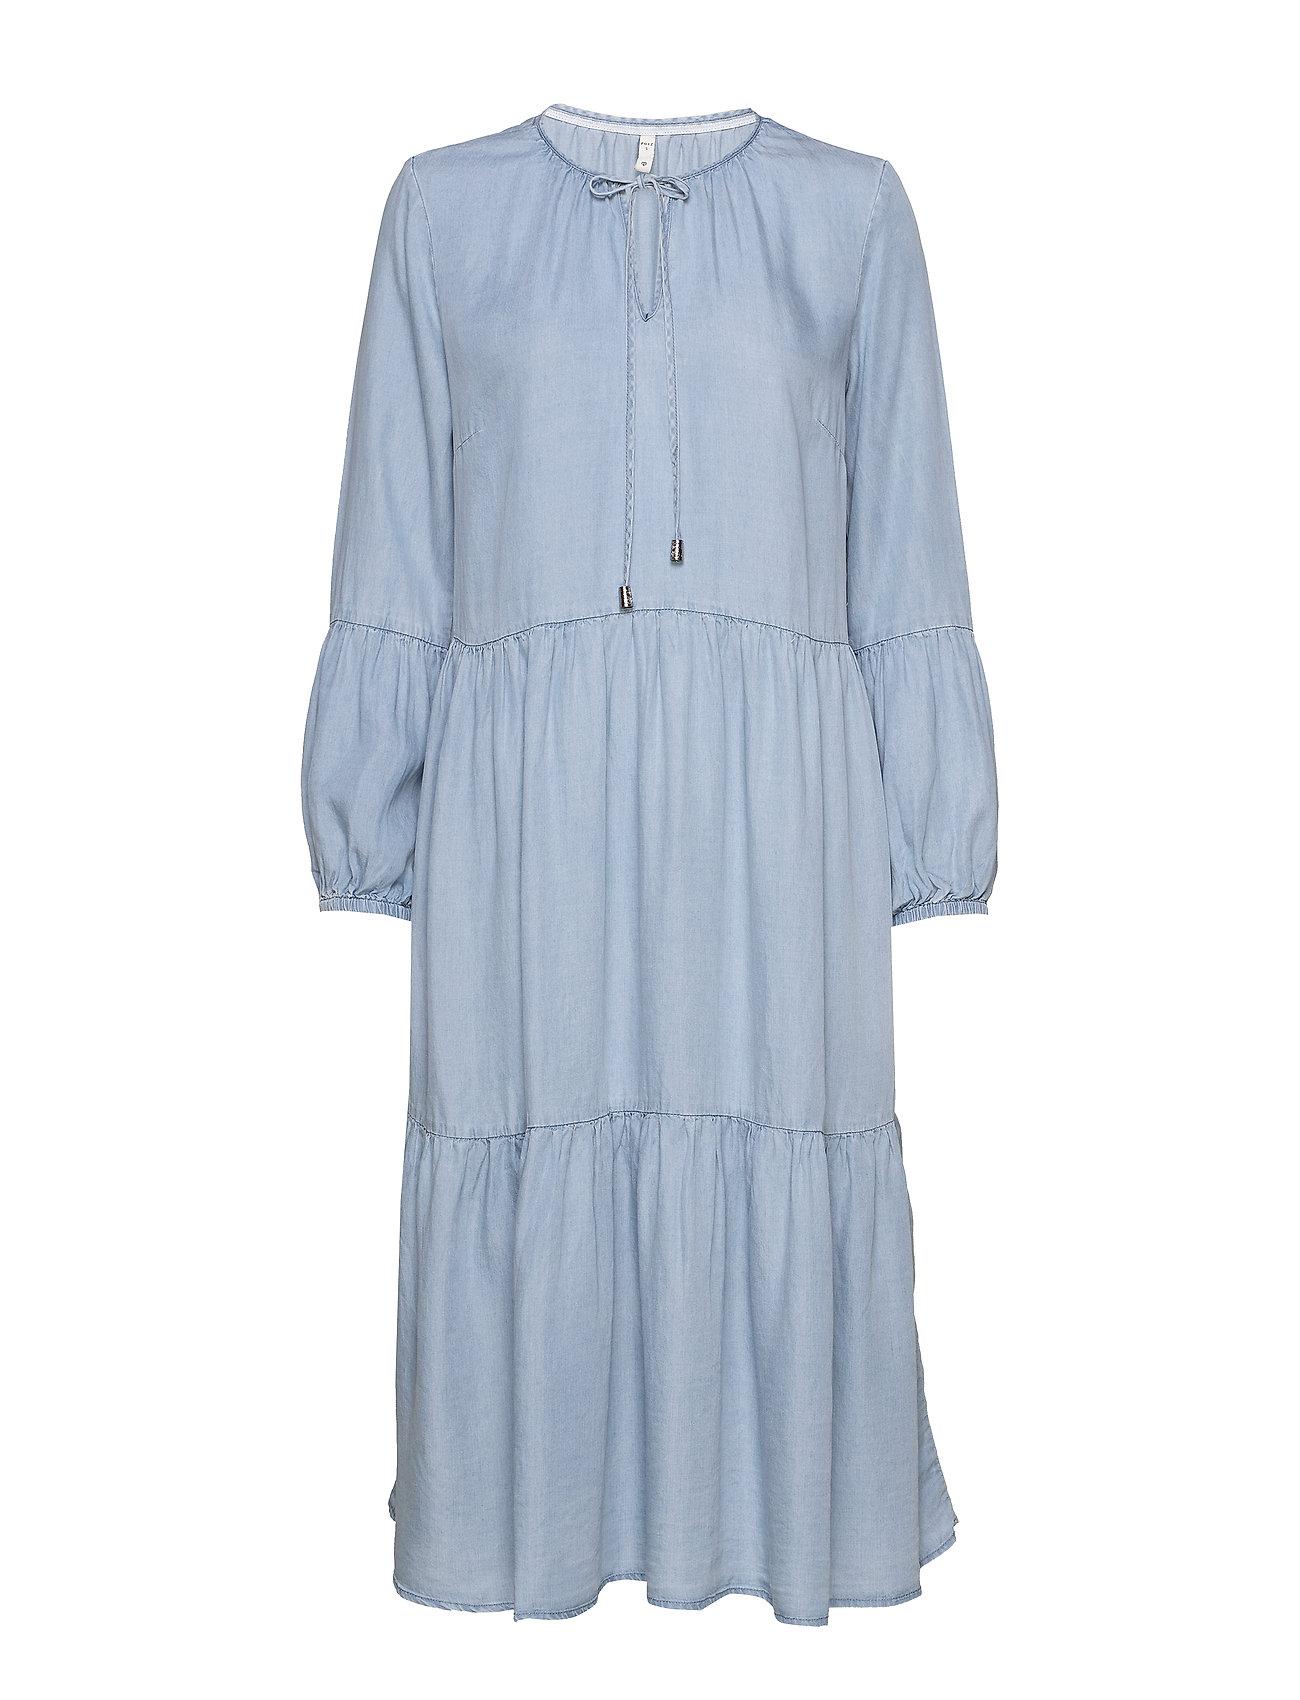 Image of Pzdonatella Dress Knælang Kjole Blå Pulz Jeans (3406307785)